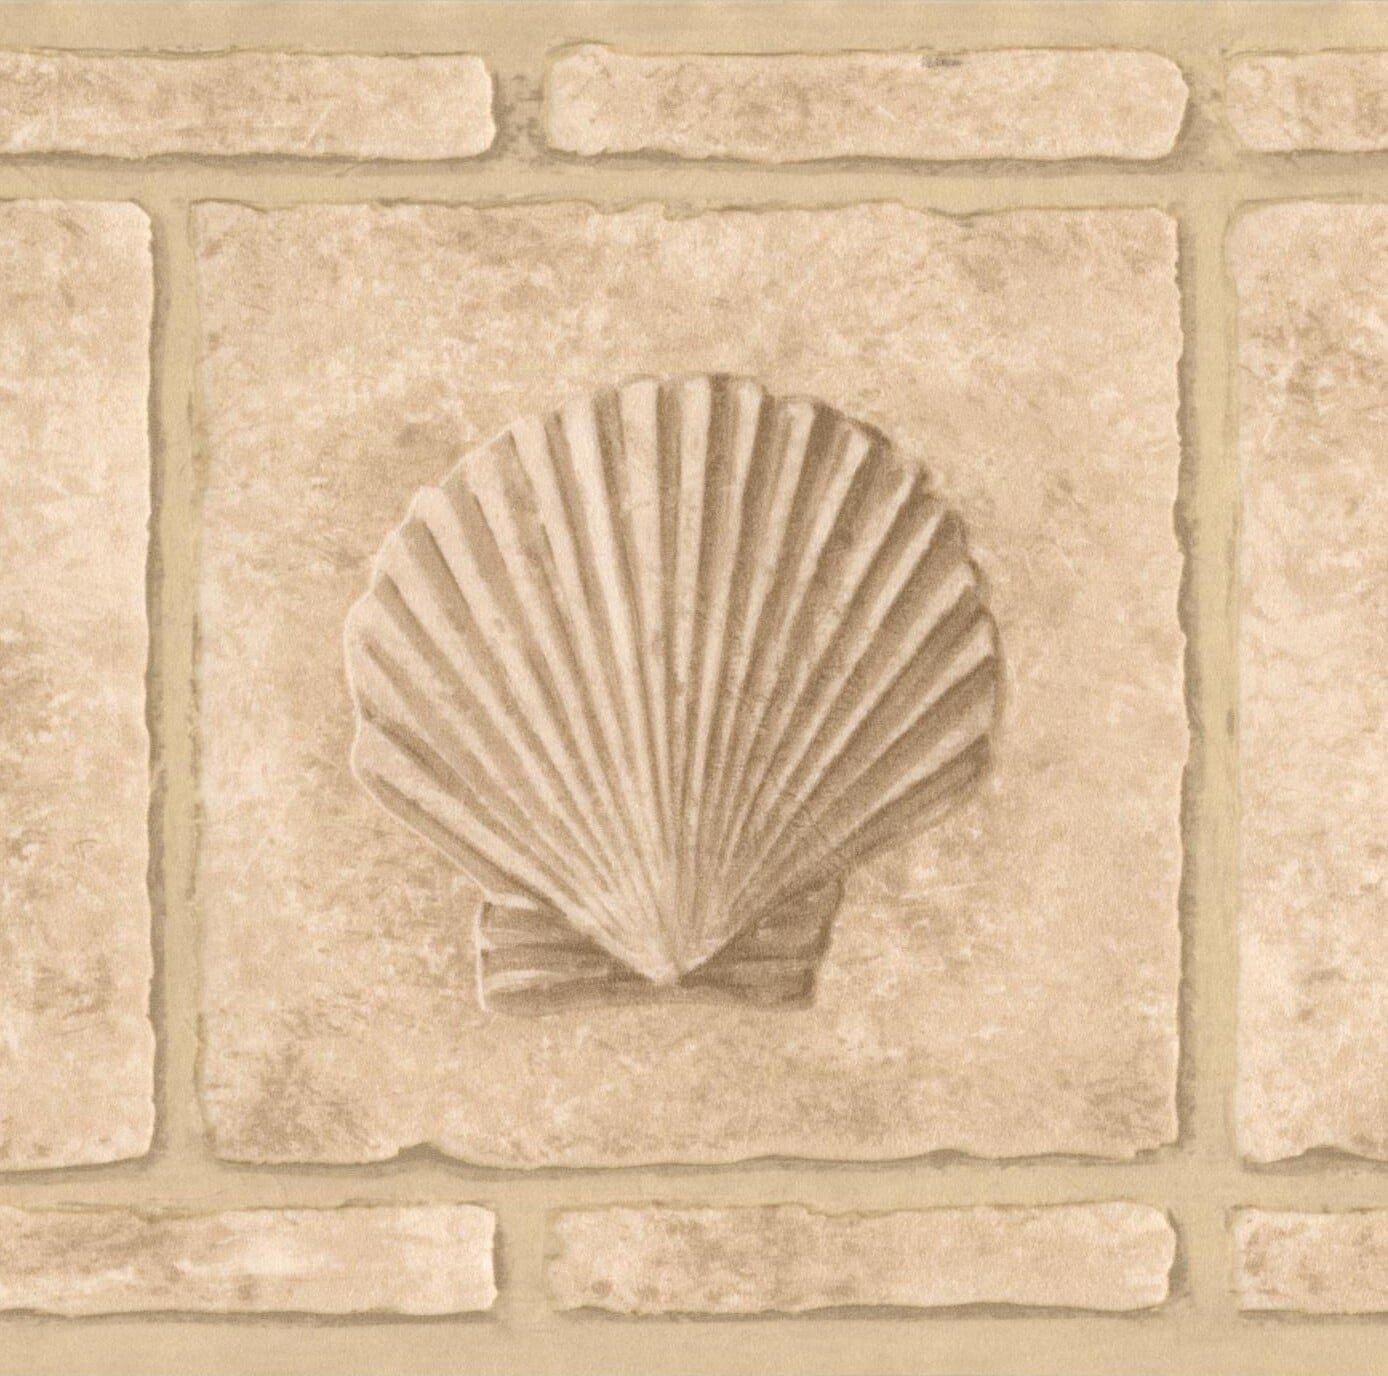 Faux Bricks with Seahorse Seashell Beige Wallpaper Border Retro Design, Roll 15' x 7''